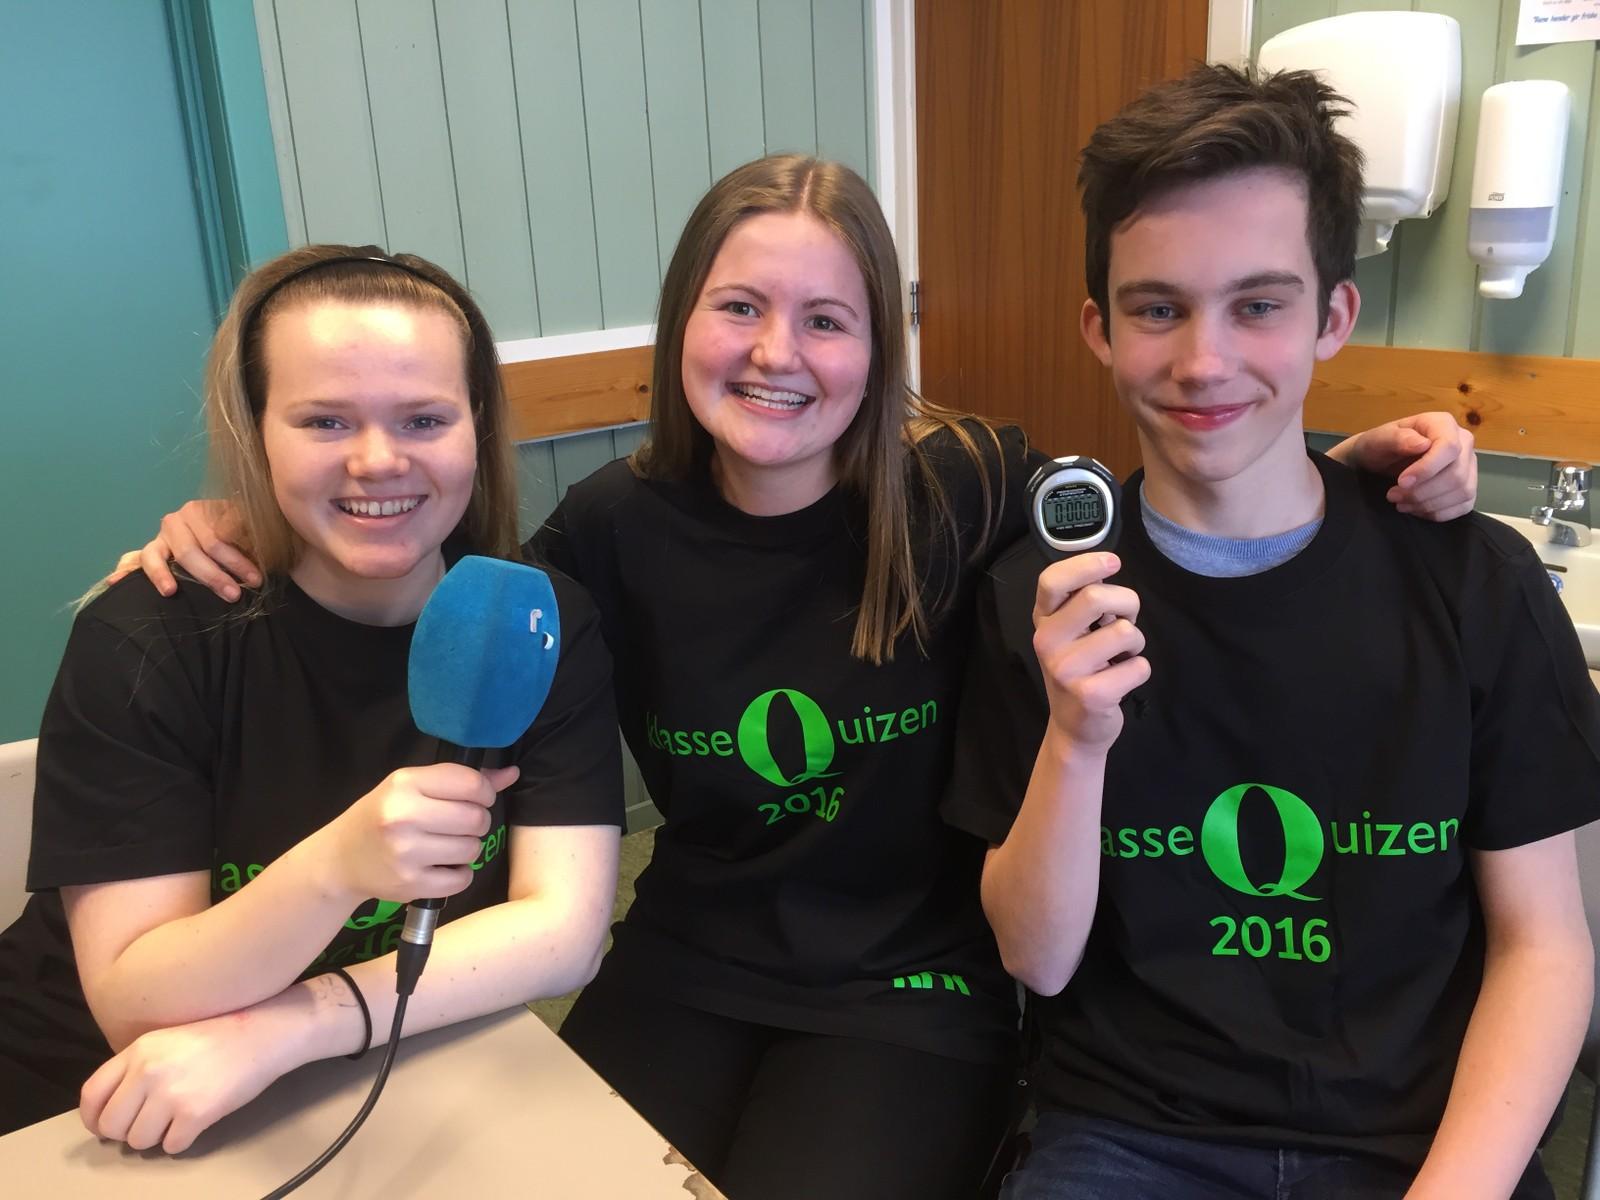 Betina Winger Andersen, Anna Aasrud og Andreas Hellum Grønberg ved Brandbu ungdomsskole fikk åtte poeng.